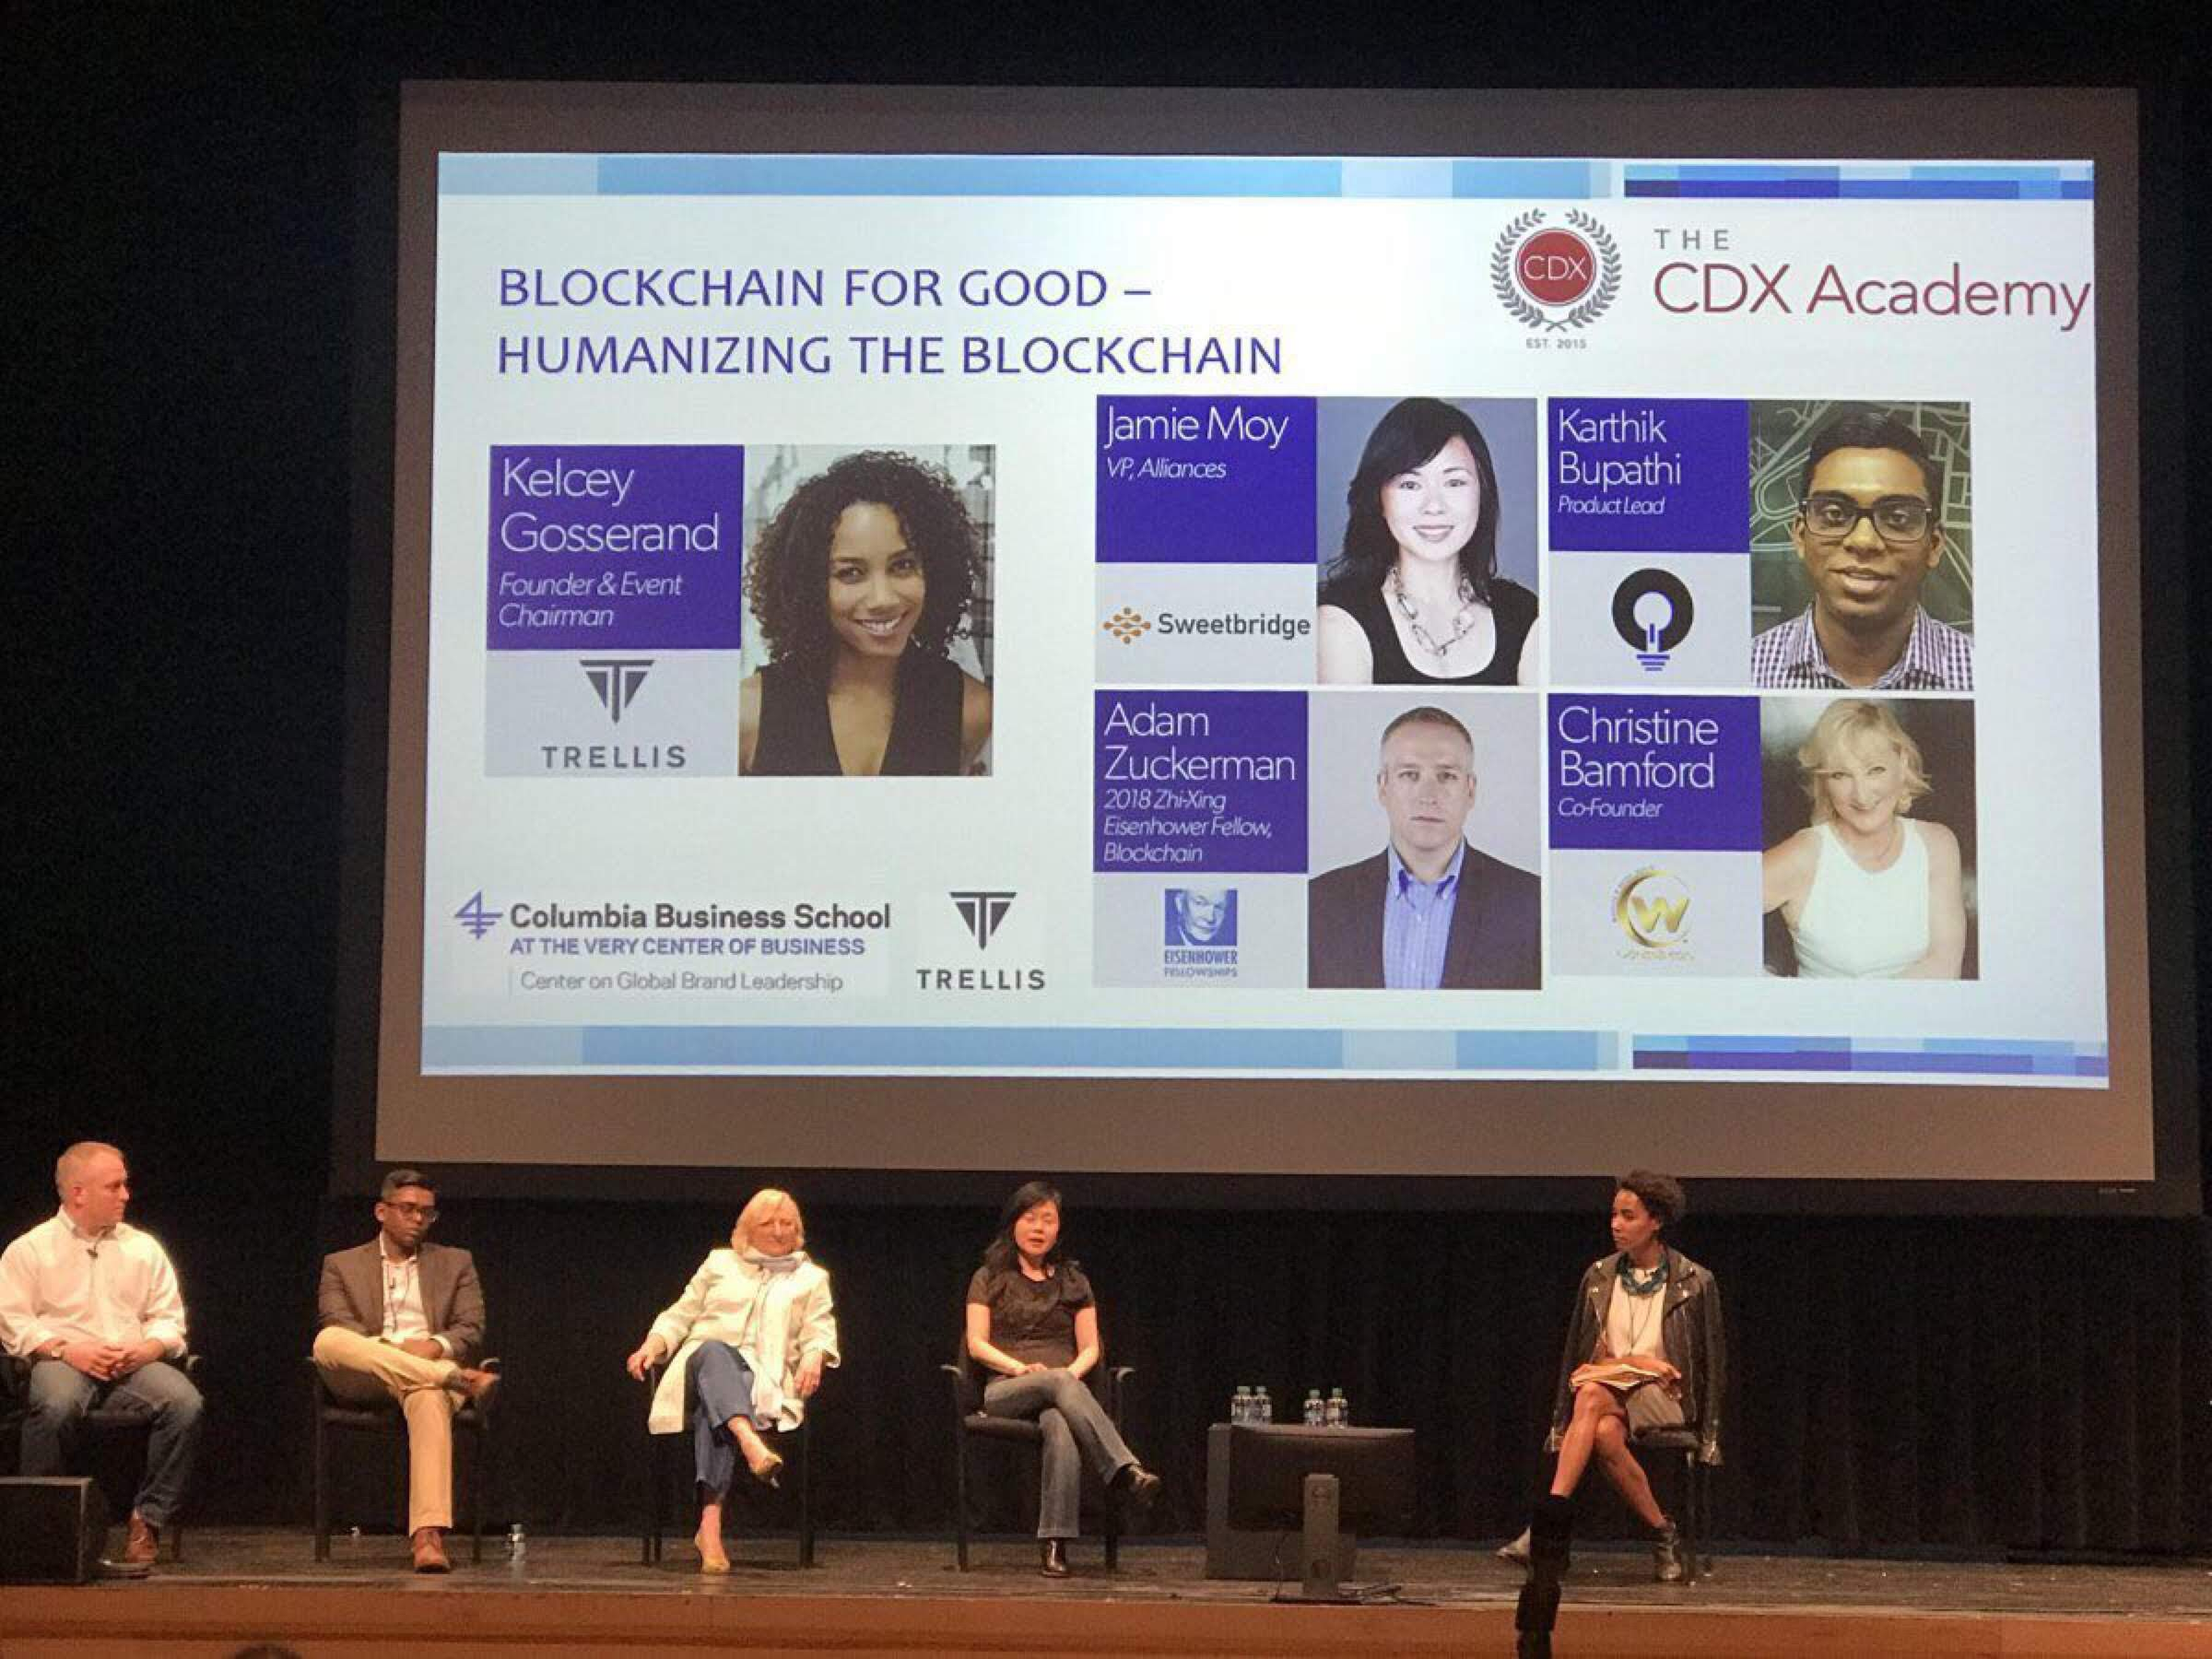 Blockchain for Good – Humanizing the Blockchain